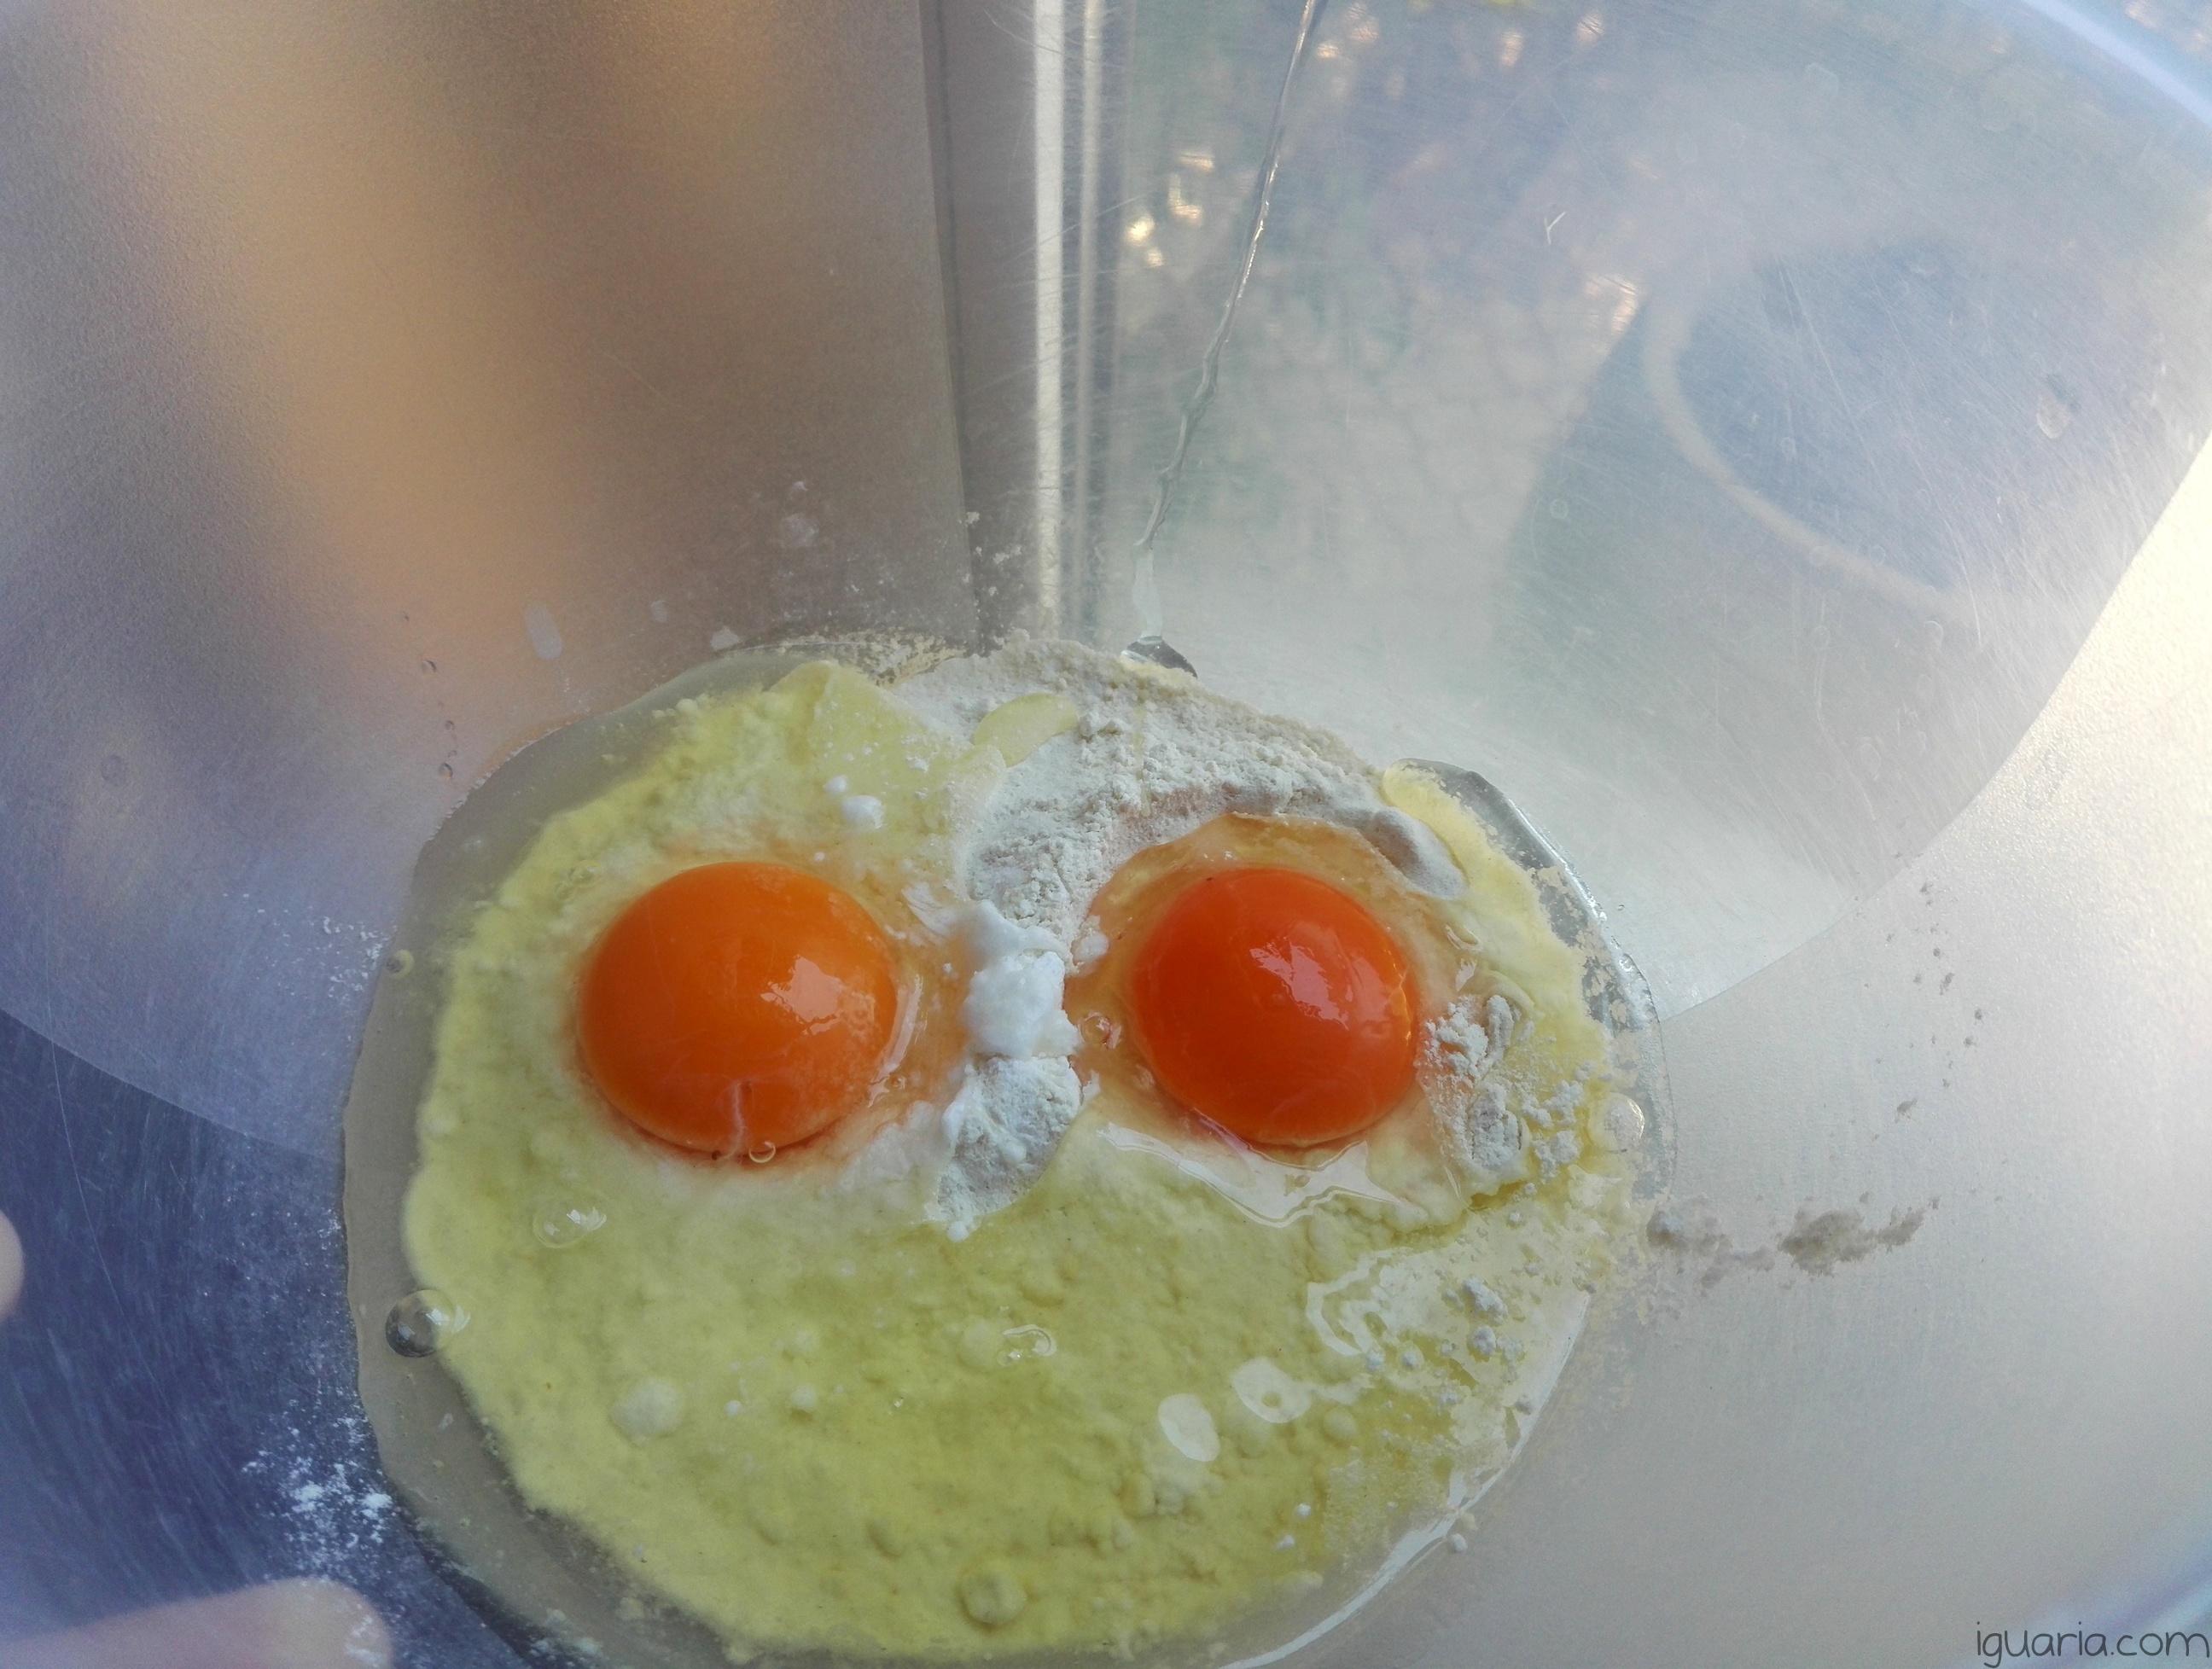 iguaria-ovos-e-farinha-para-polme